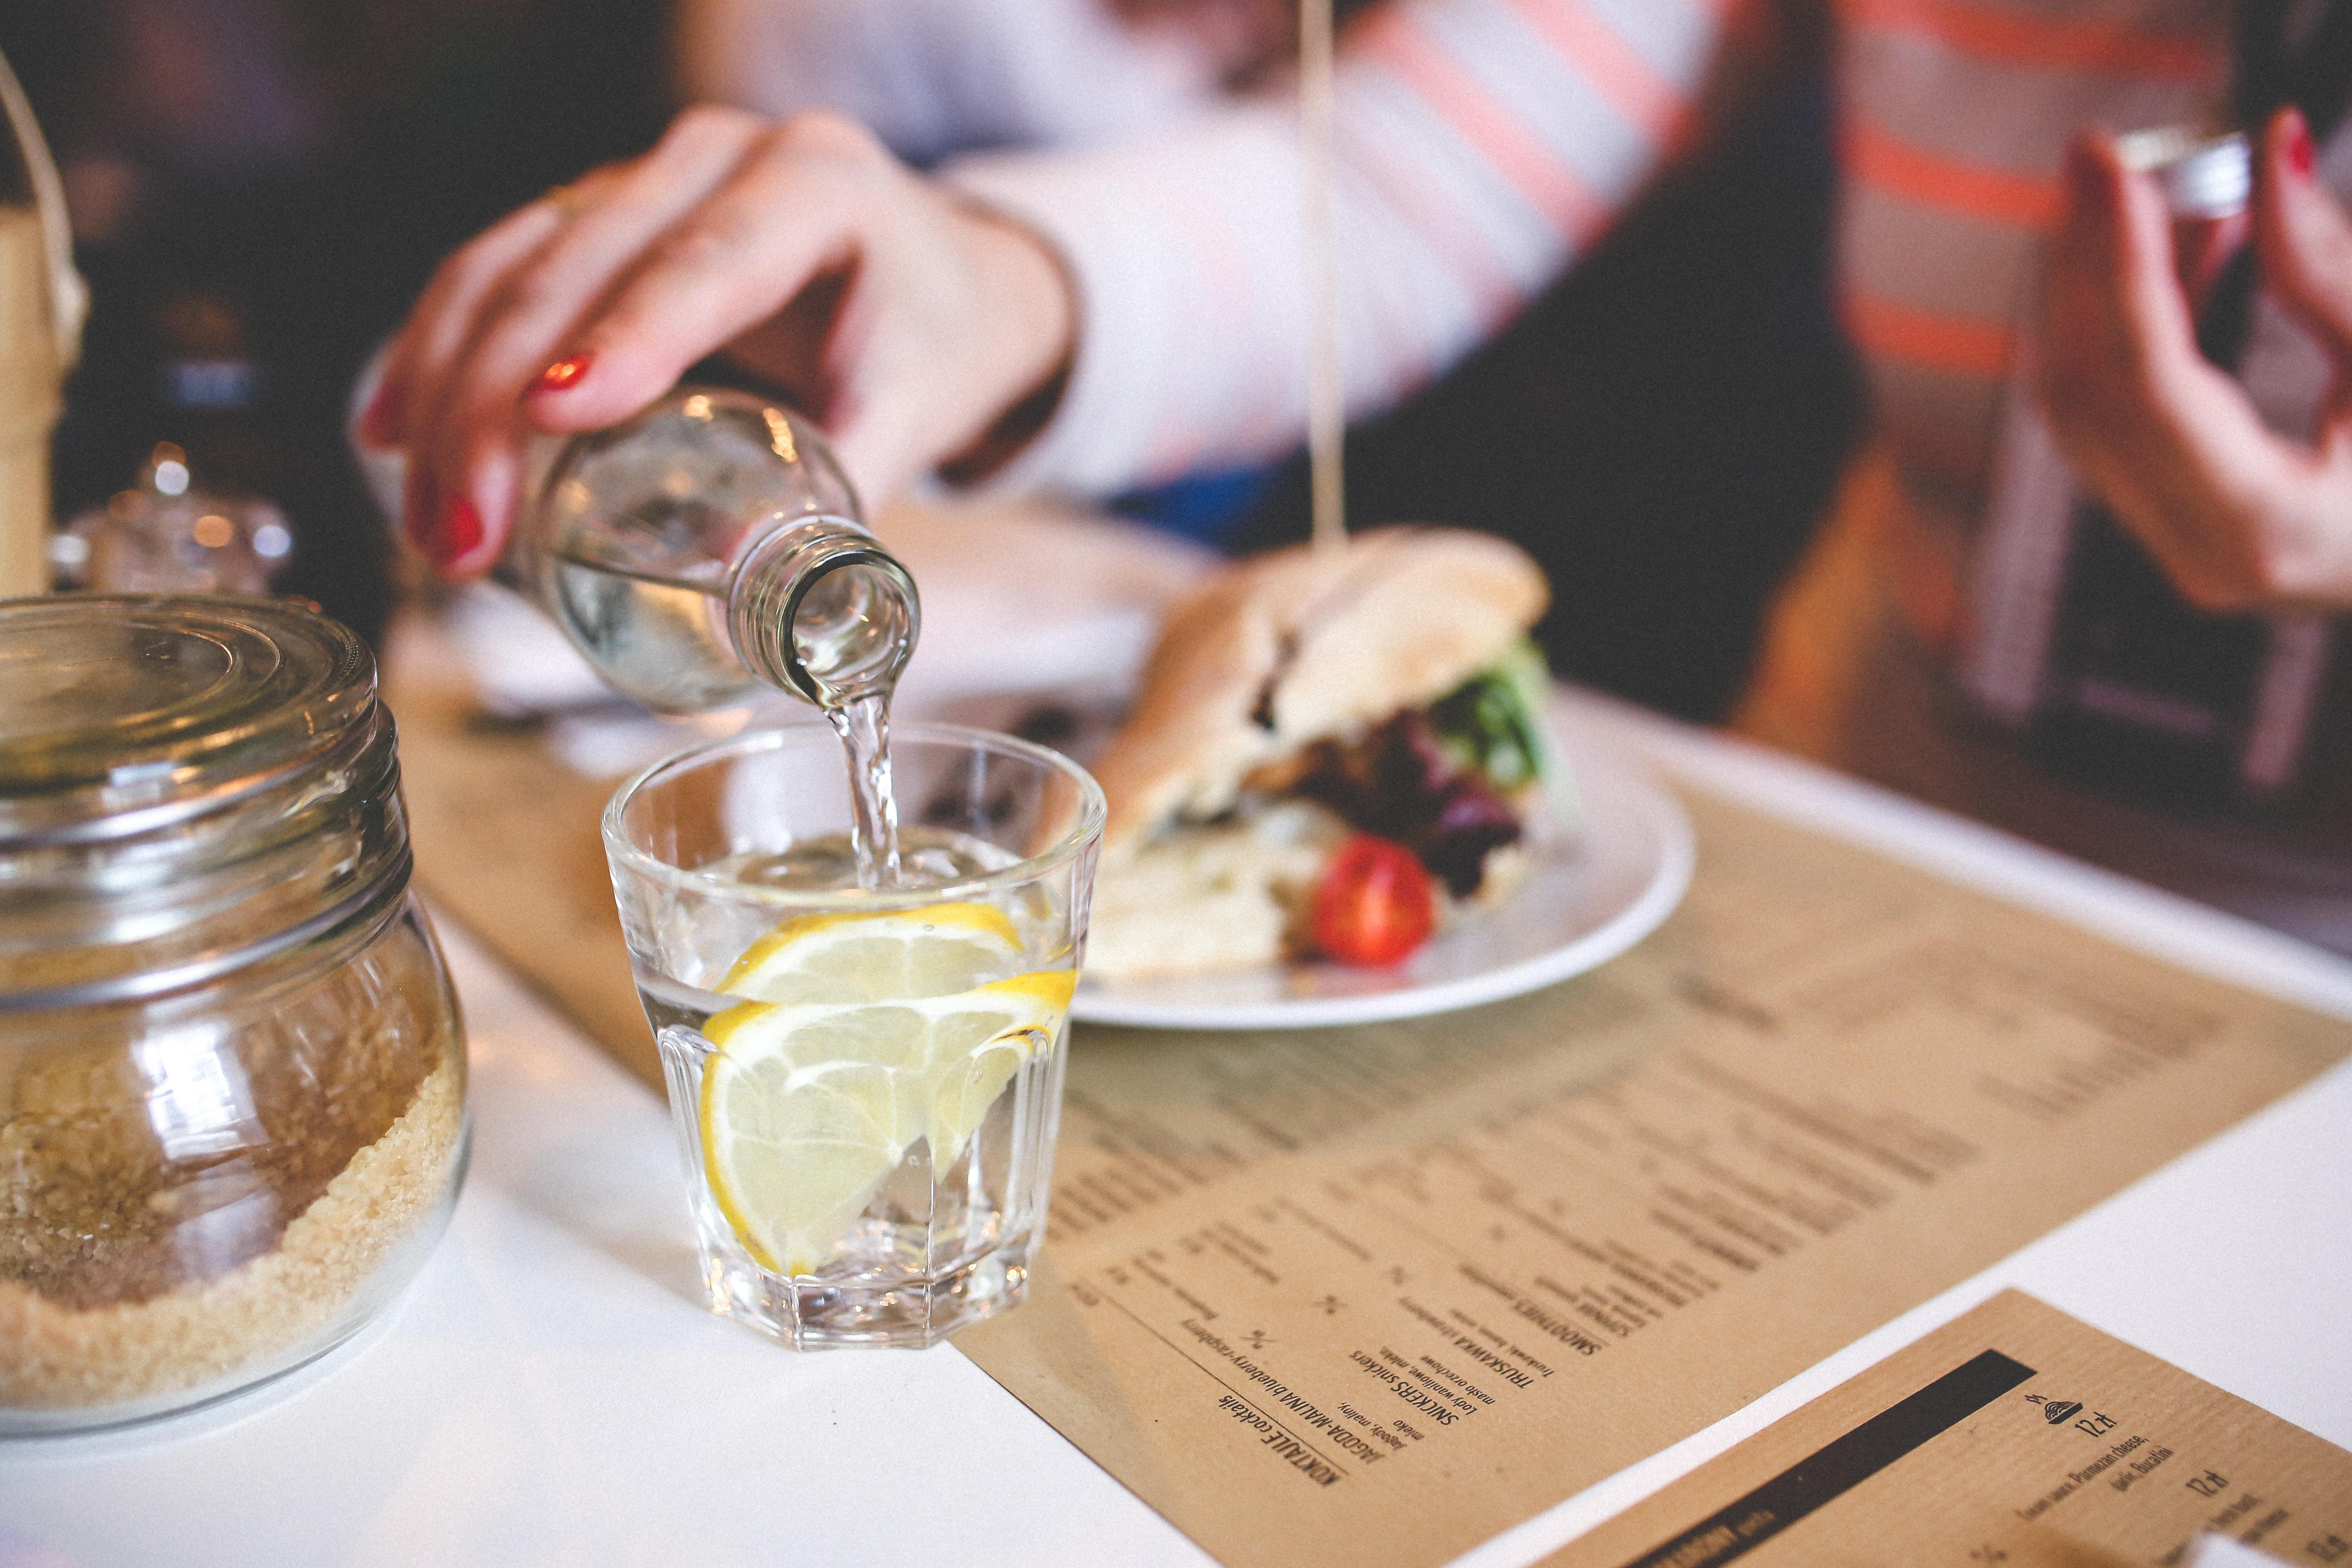 diner-dinner-drinking-6216